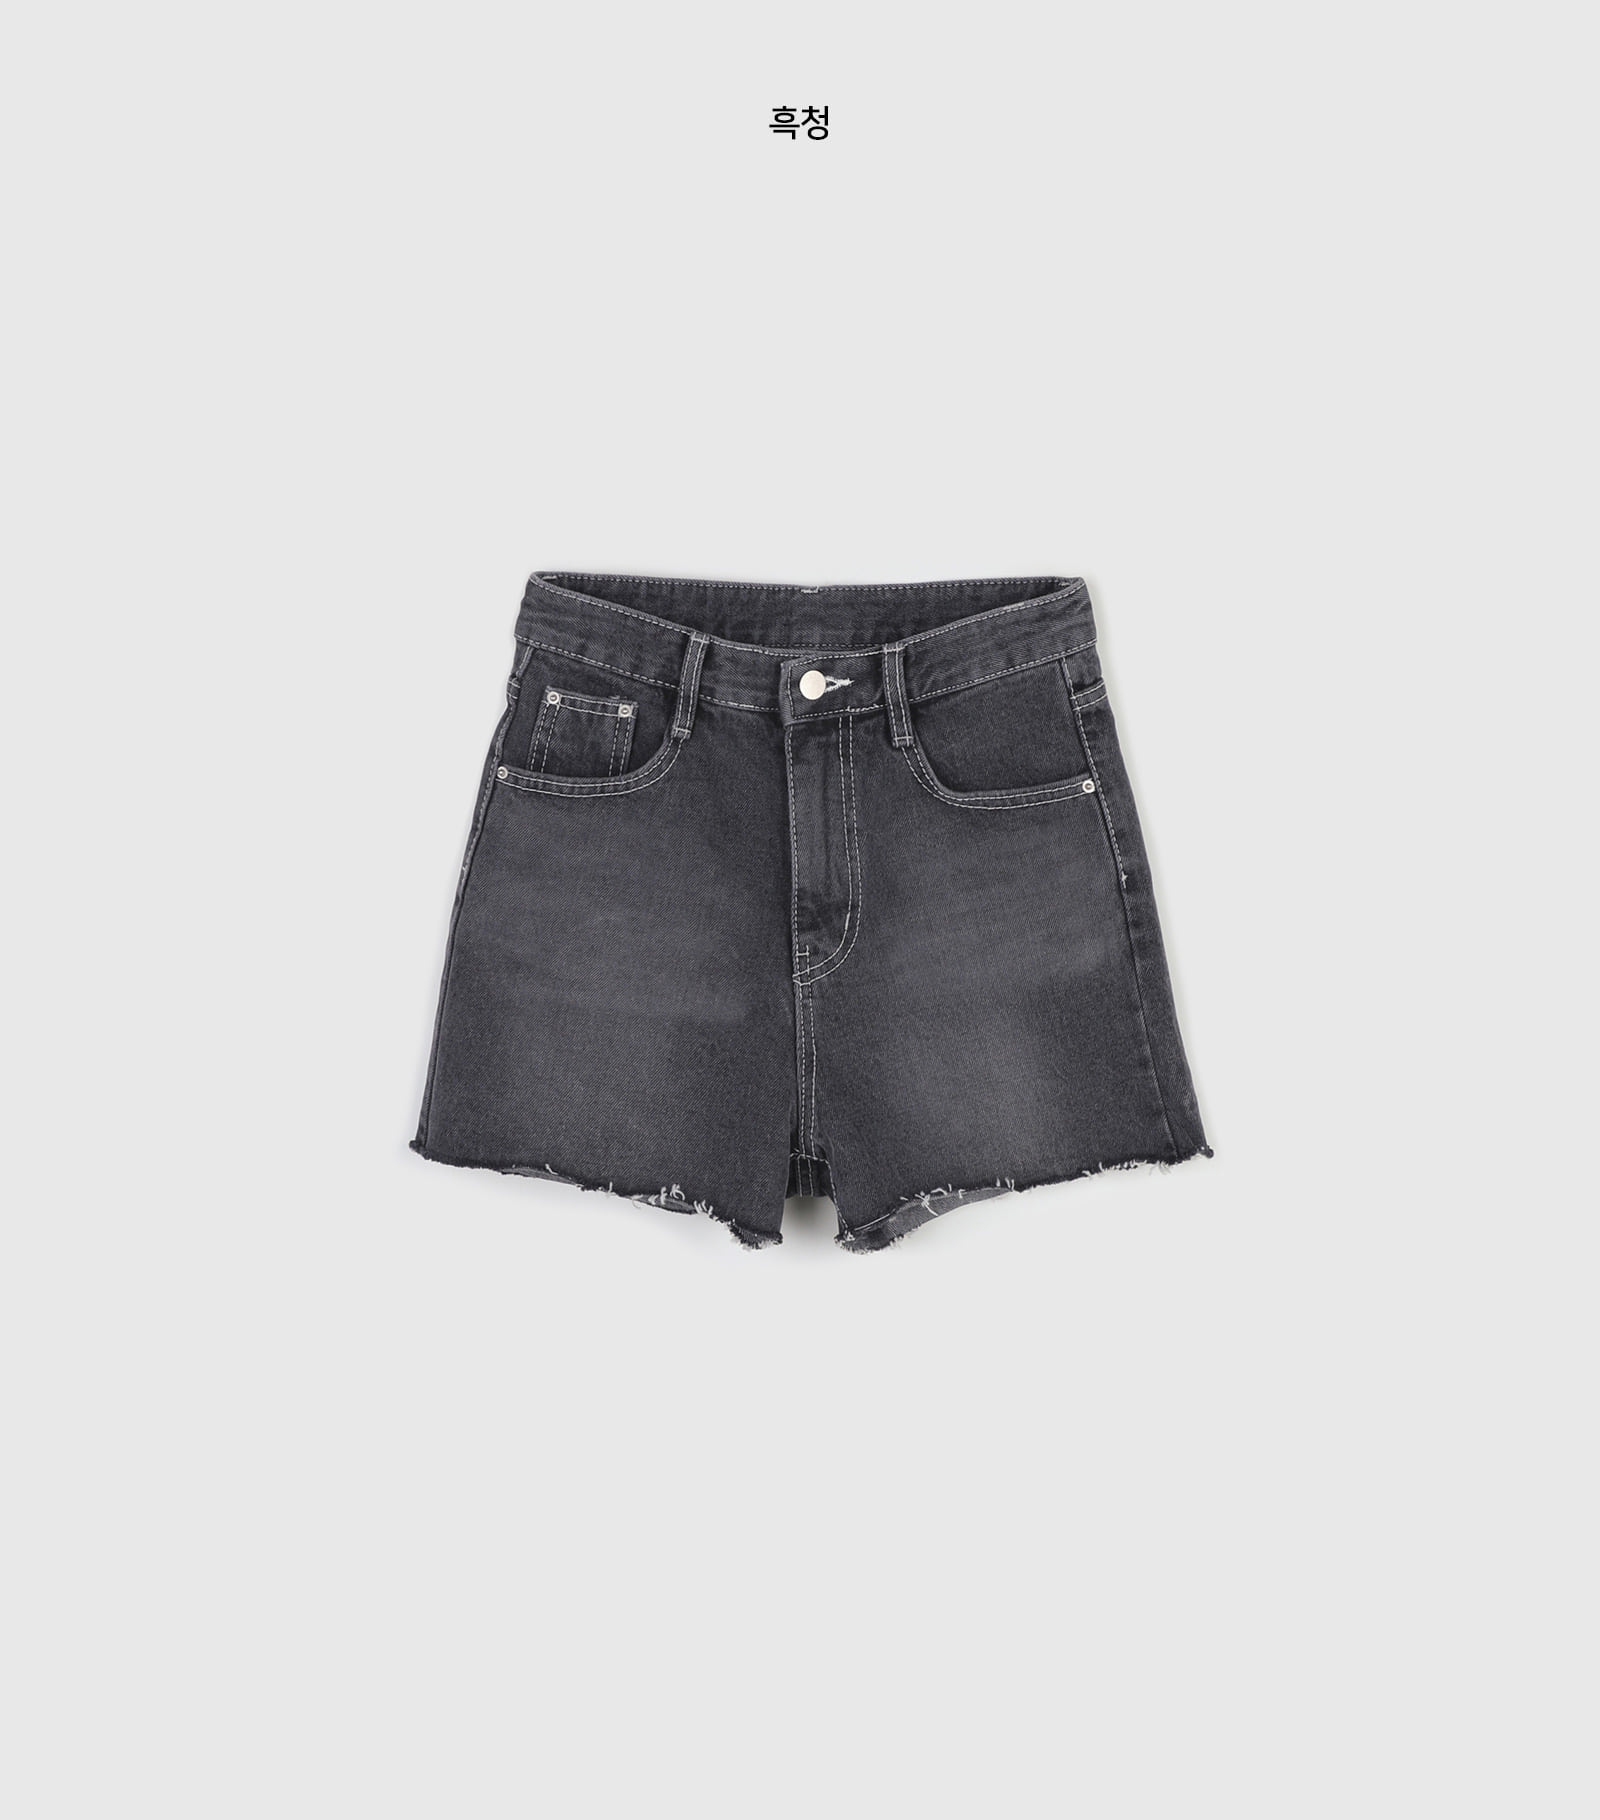 Dust cutting half jeans